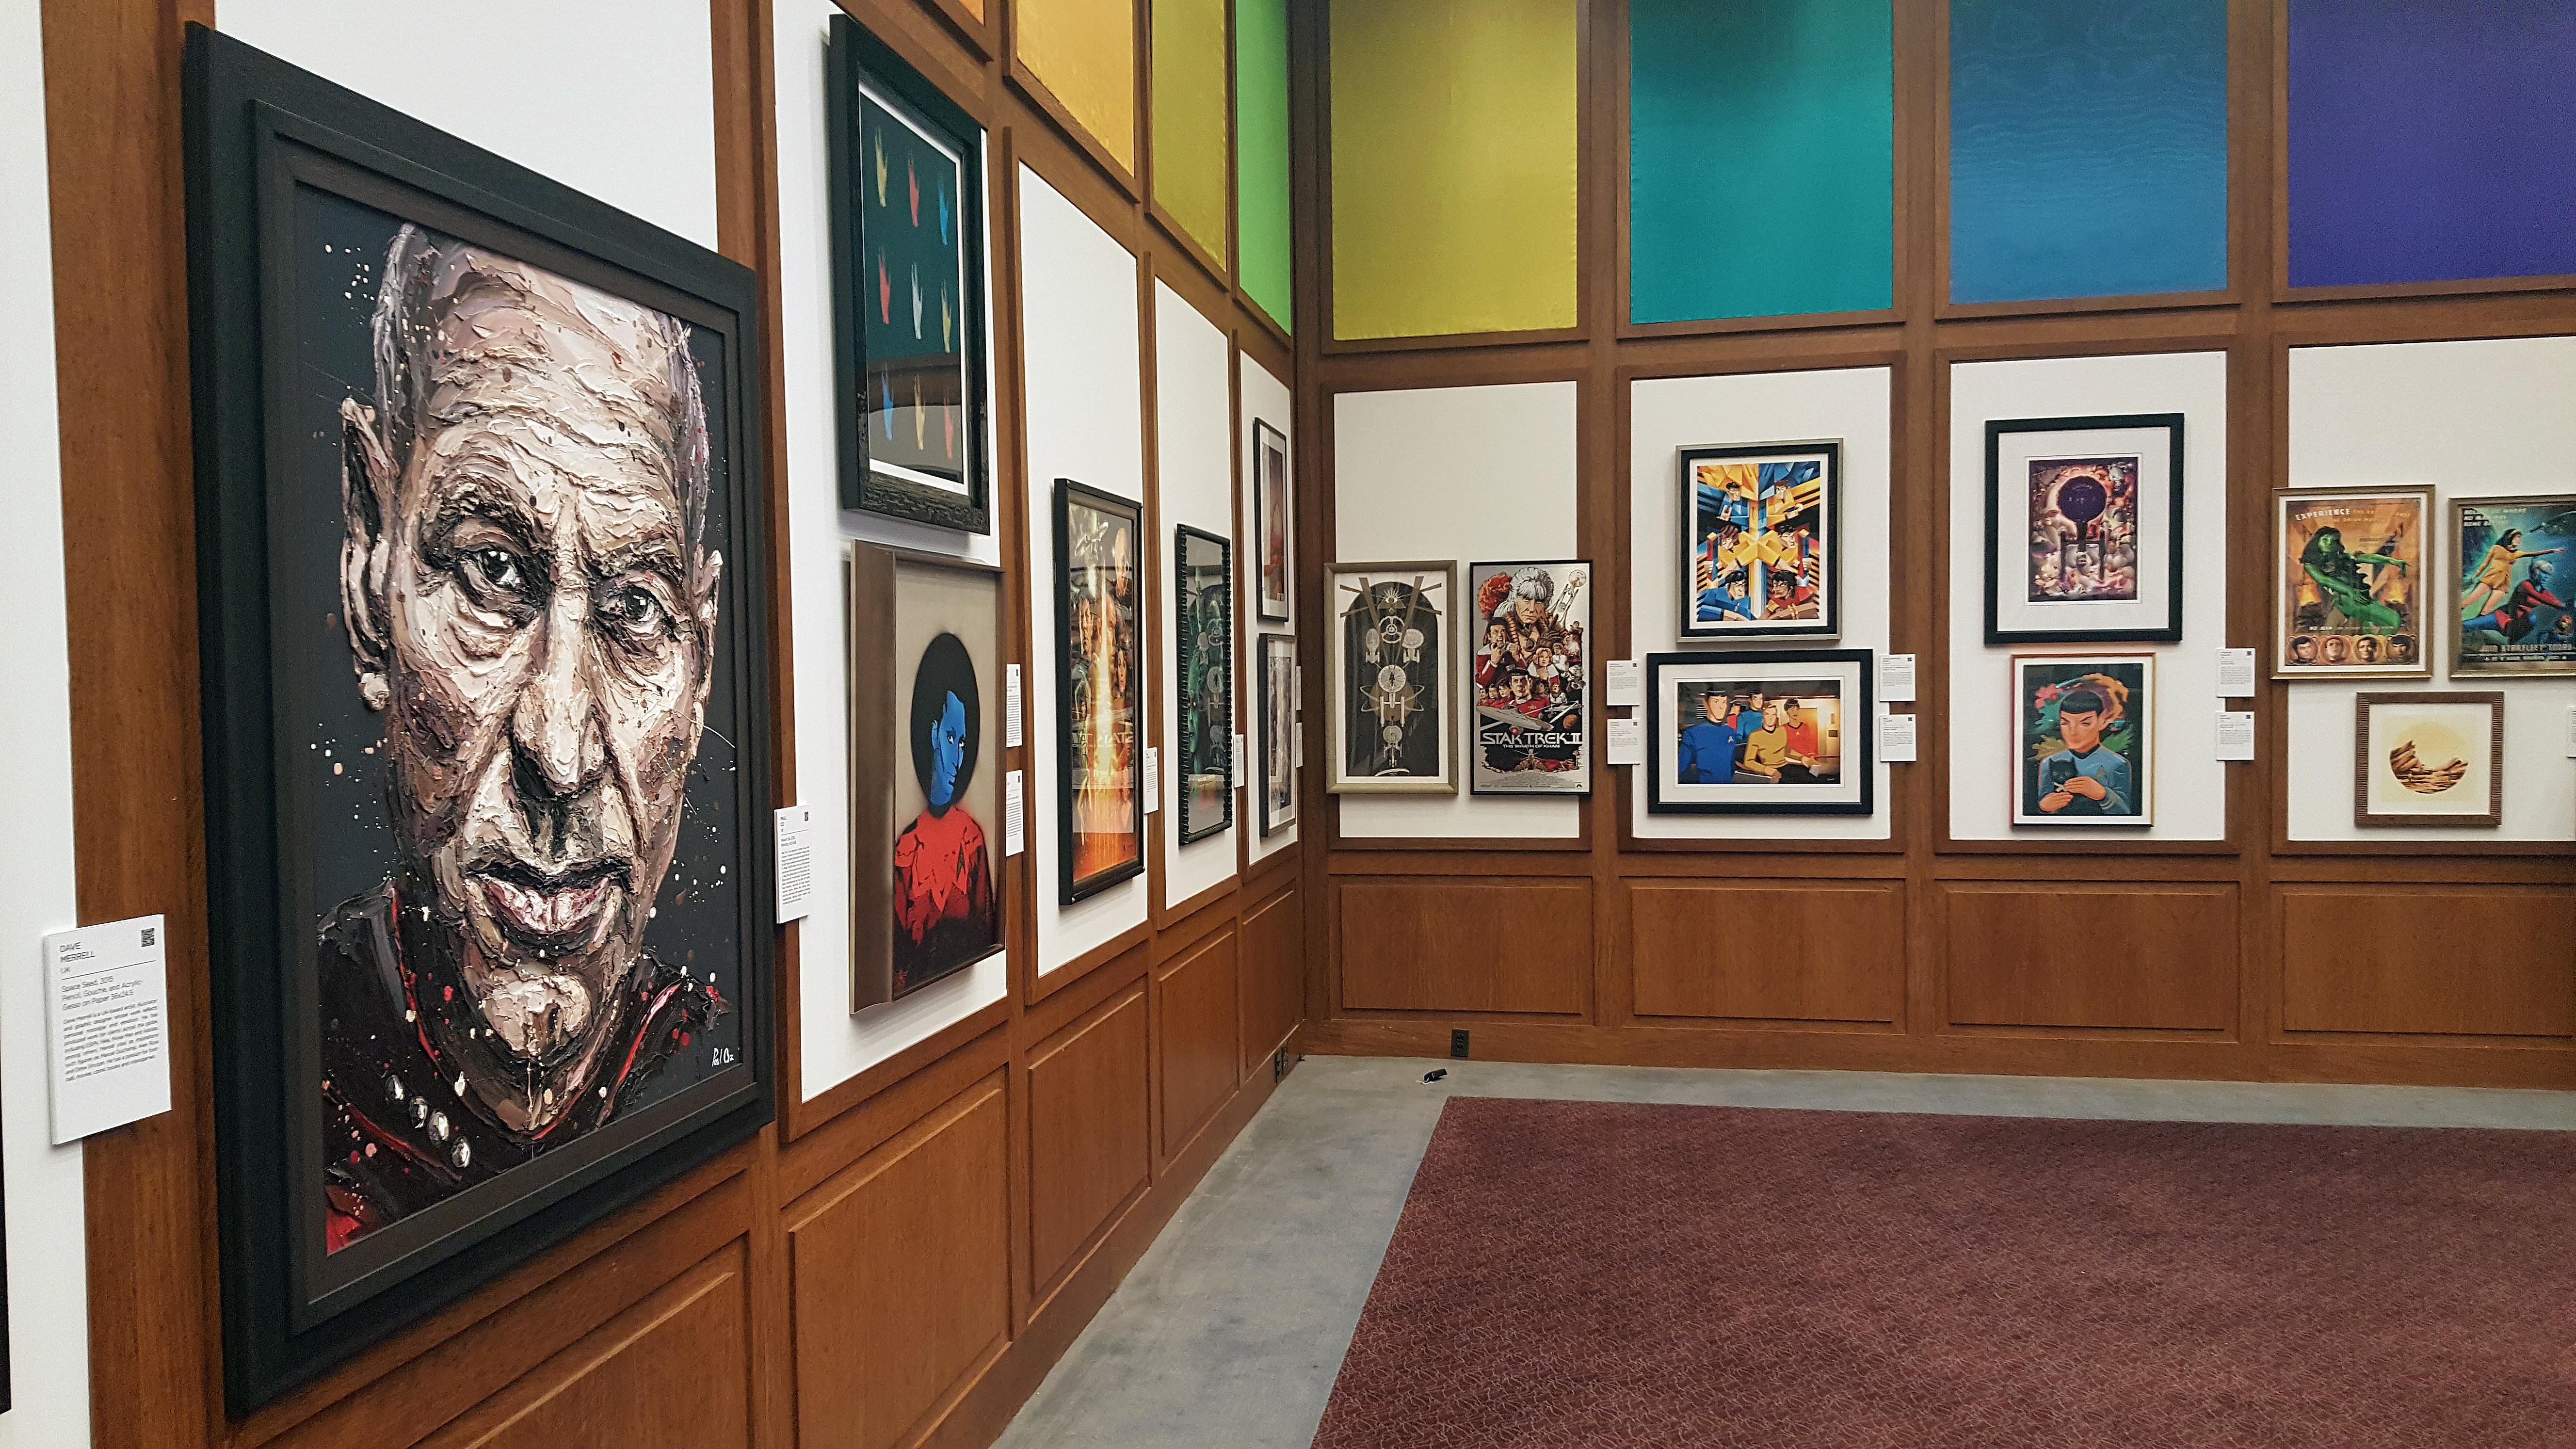 'Star Trek' Celebrates 50th Anniversary With Traveling Art Gallery